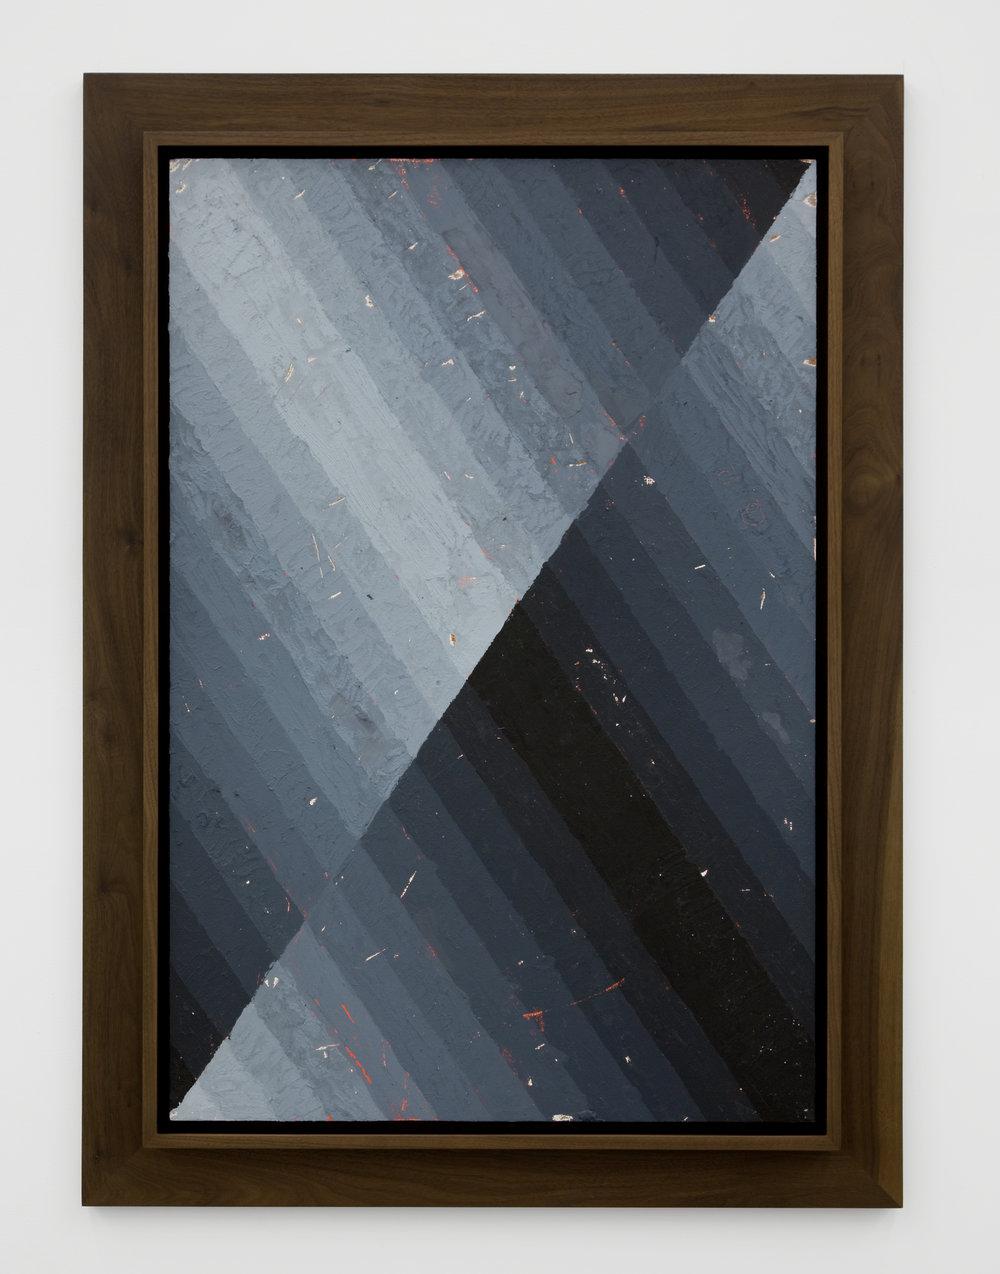 Execution Changes #48 (XS, Q1, URJ, DC, Q2, URJ, LC, Q3, LLJ, LC, Q4, LLJ, DC), 2012 acrylic on panel 109,2 x 78,7 cm - 43 x 31 inches